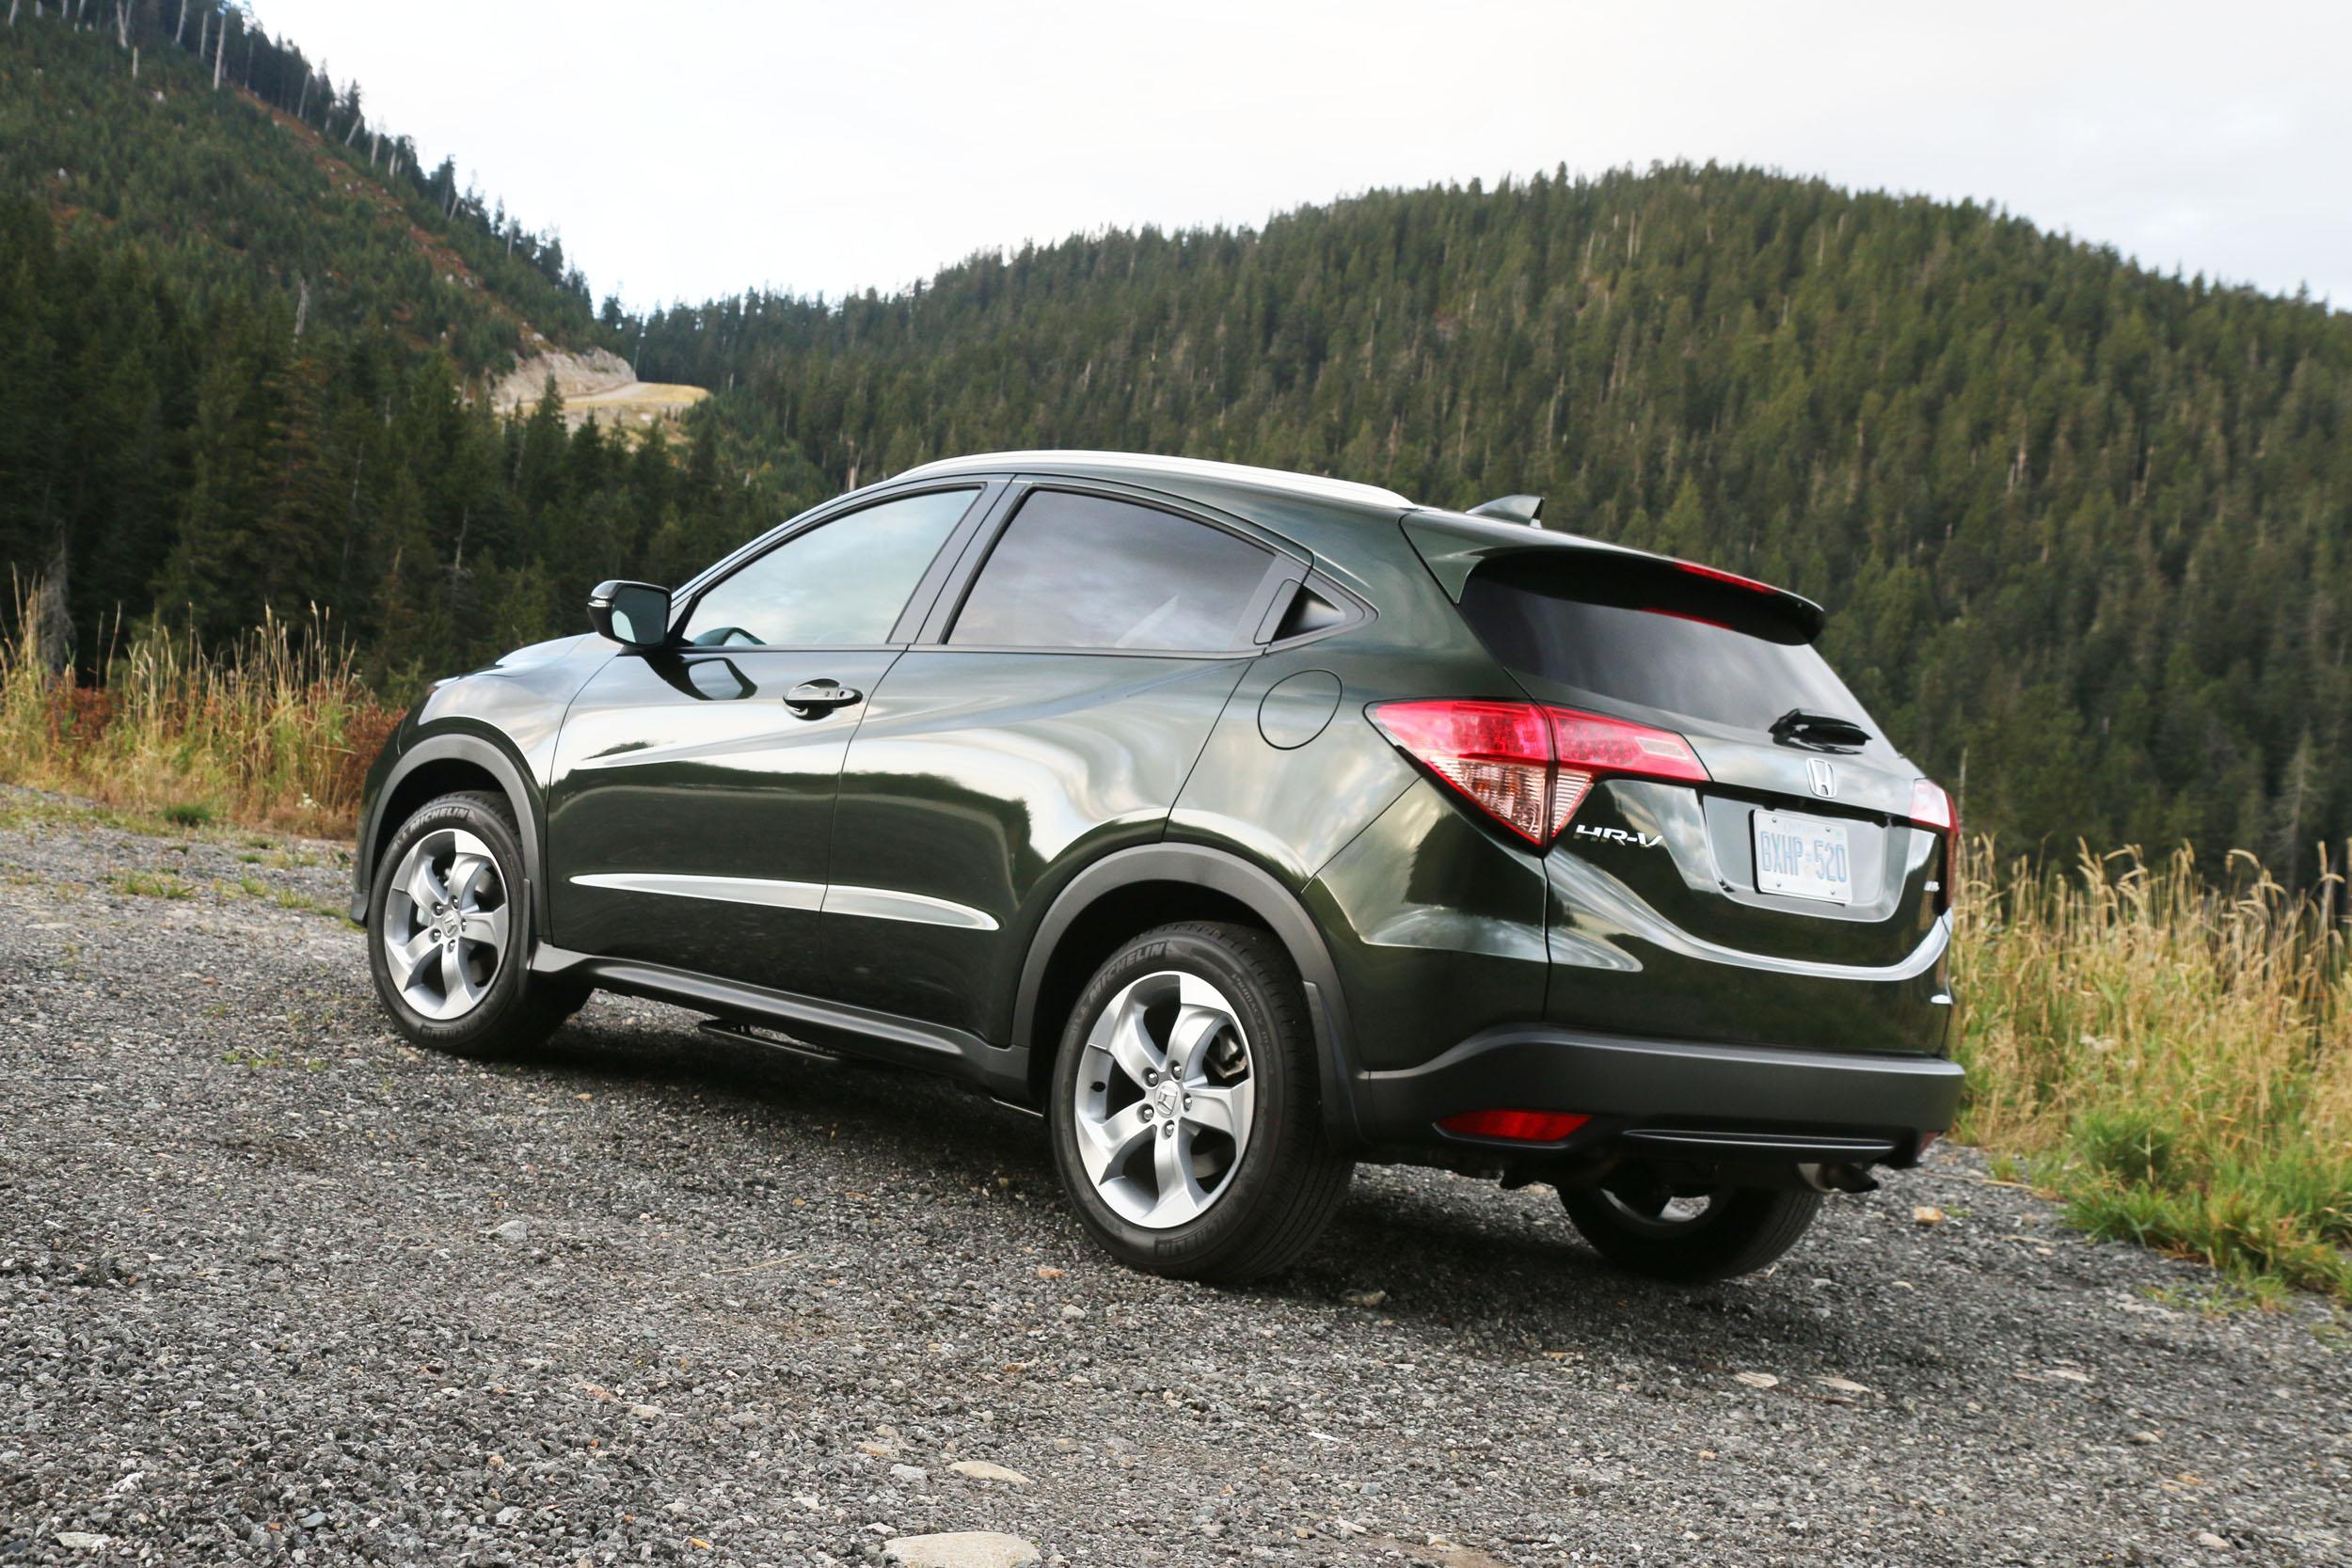 Honda HR V LX AWD 2016 - International Price & Overview